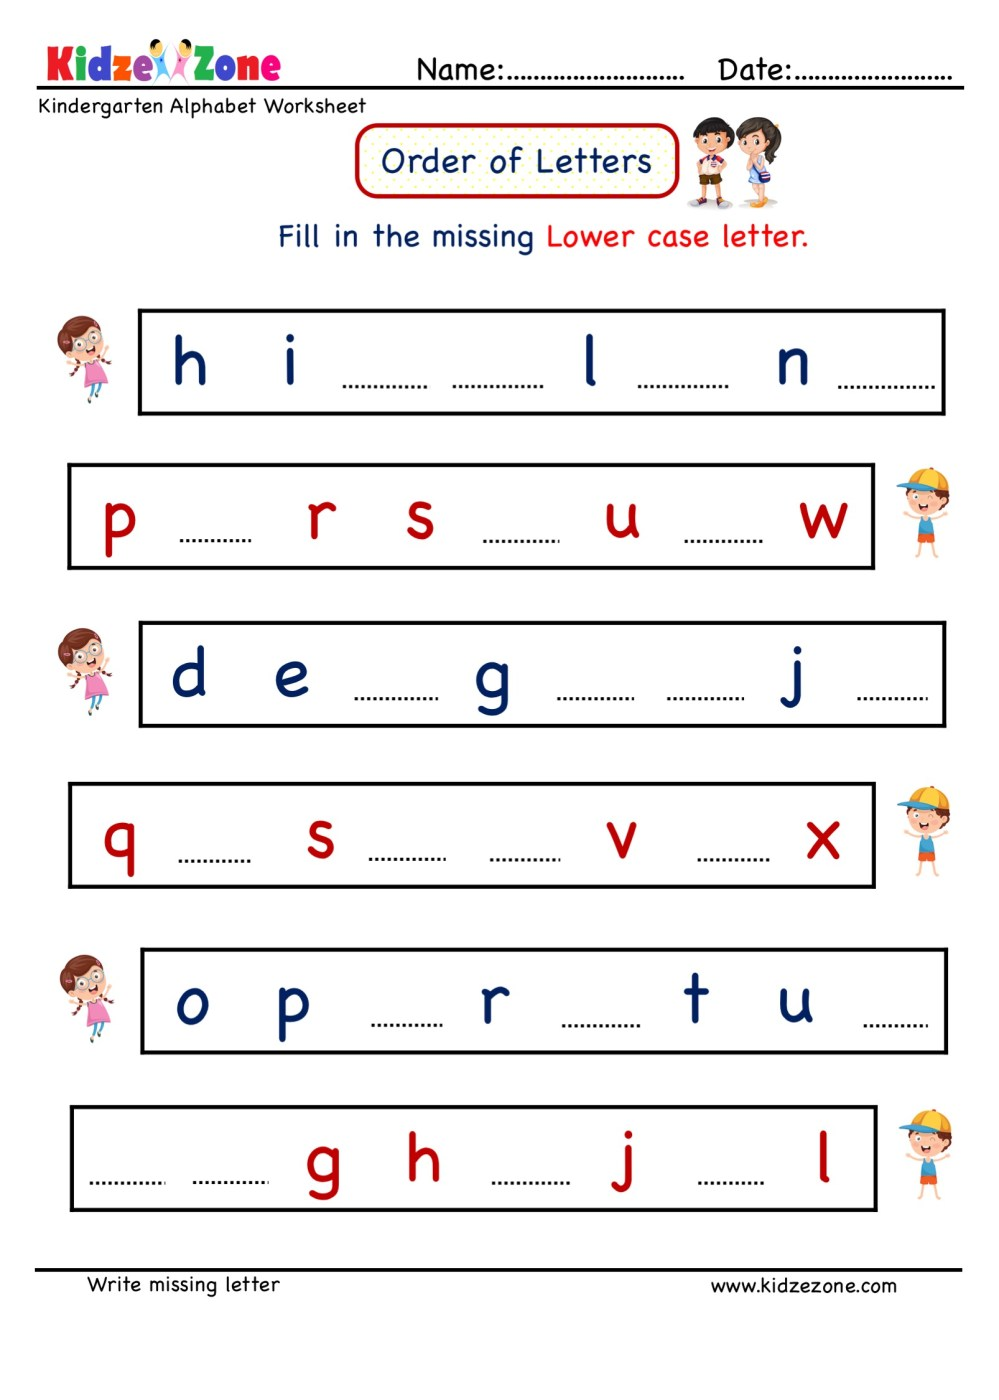 medium resolution of Kindergarten Letter worksheets - Write Missing Letter